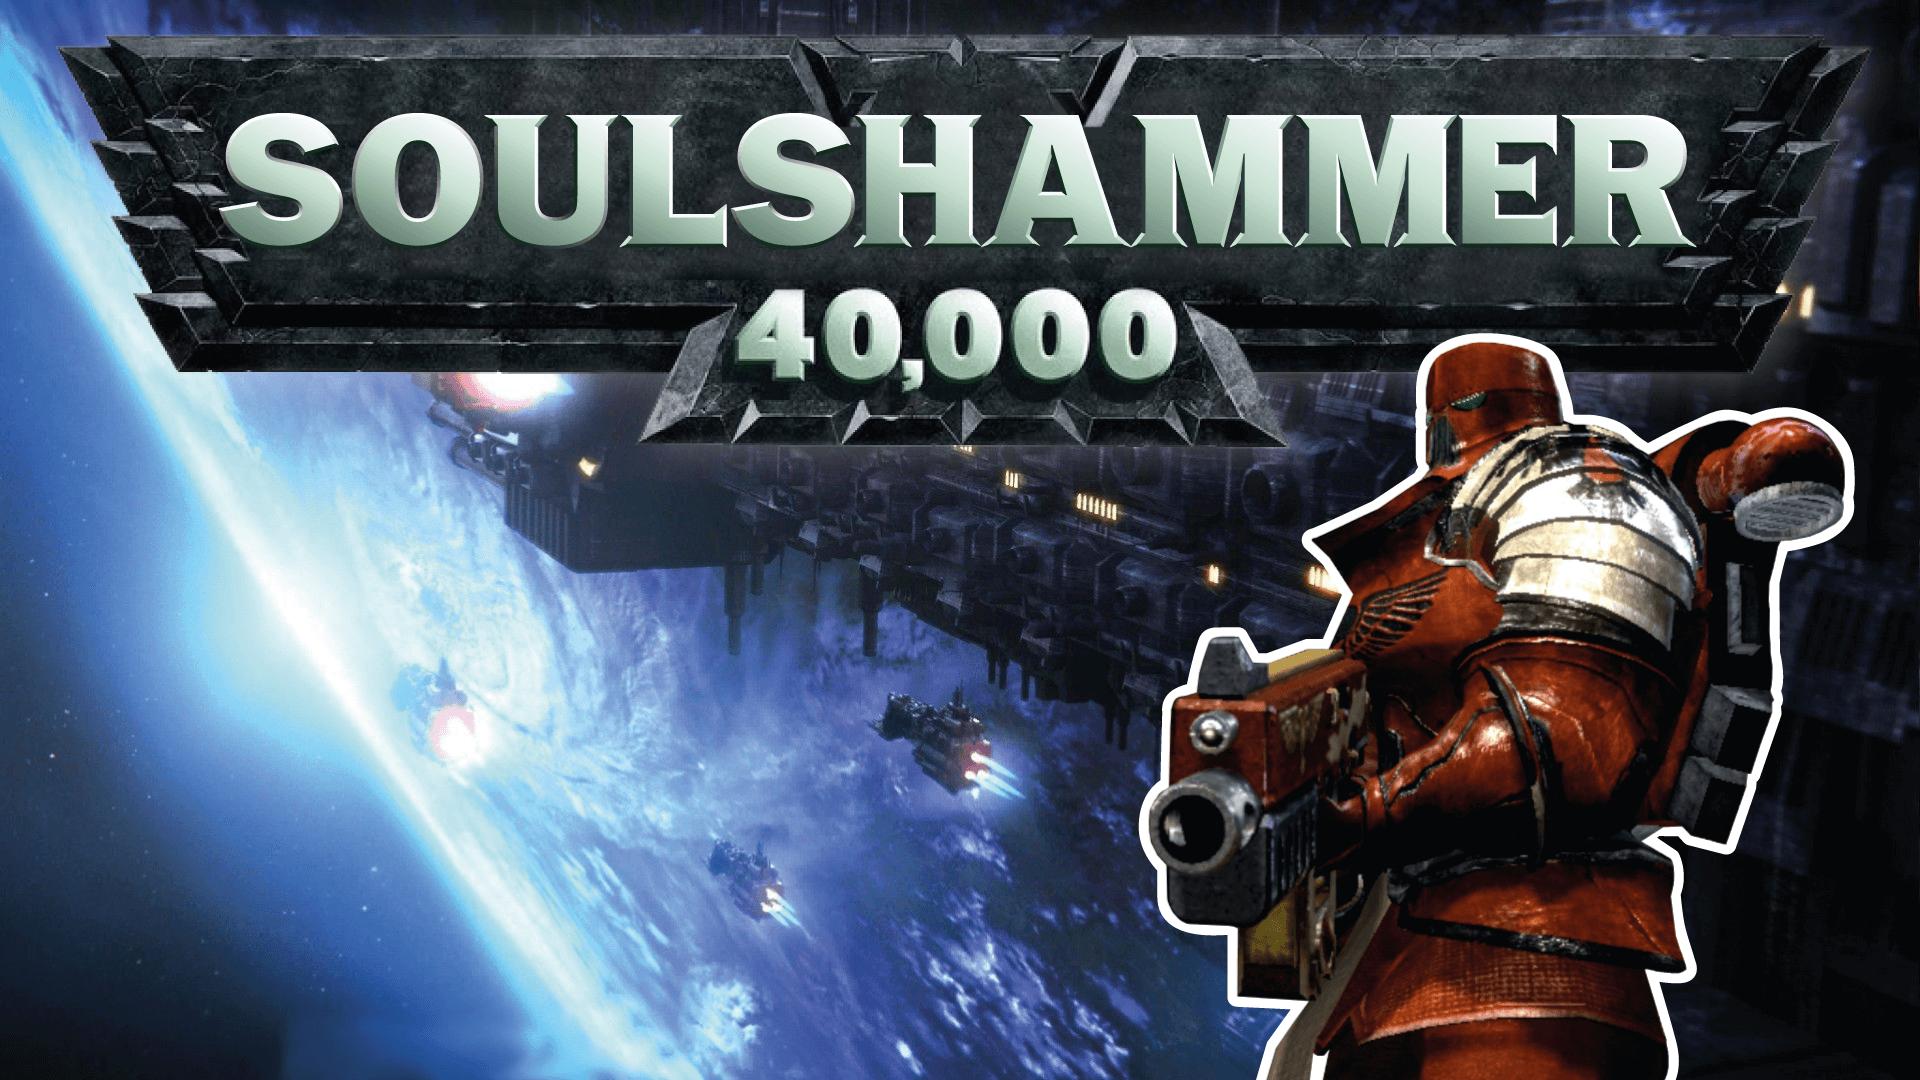 Soulshammer 40,000 mod brings Space Marines to Dark Souls | PC Gamer